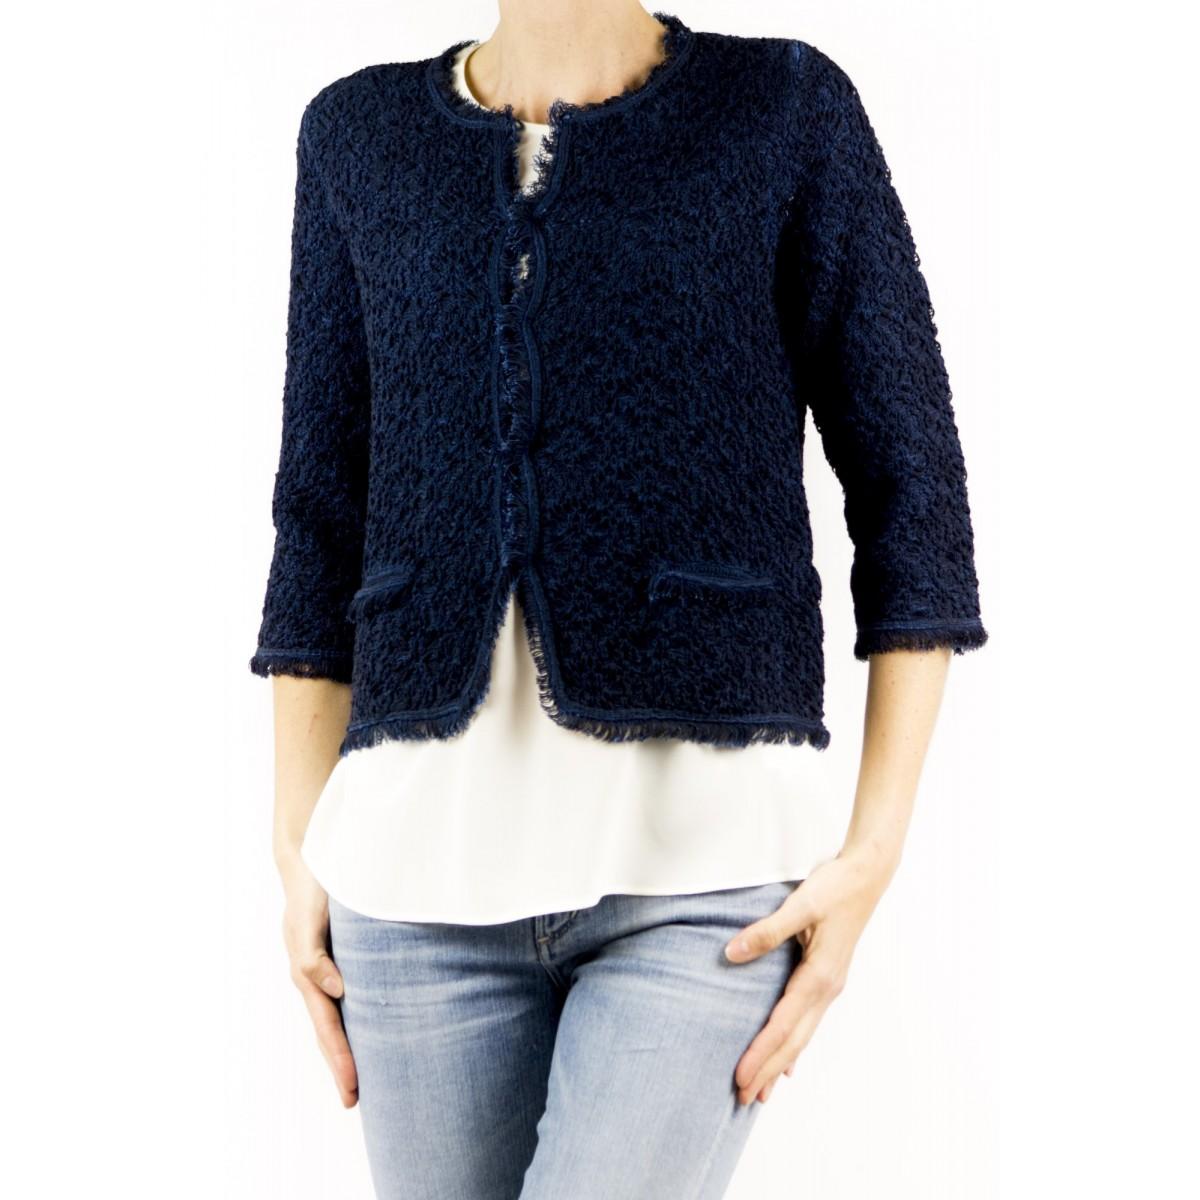 Jacket Kangra Frauen - 8710/58 Chanel Lavorata 48 - blu navy